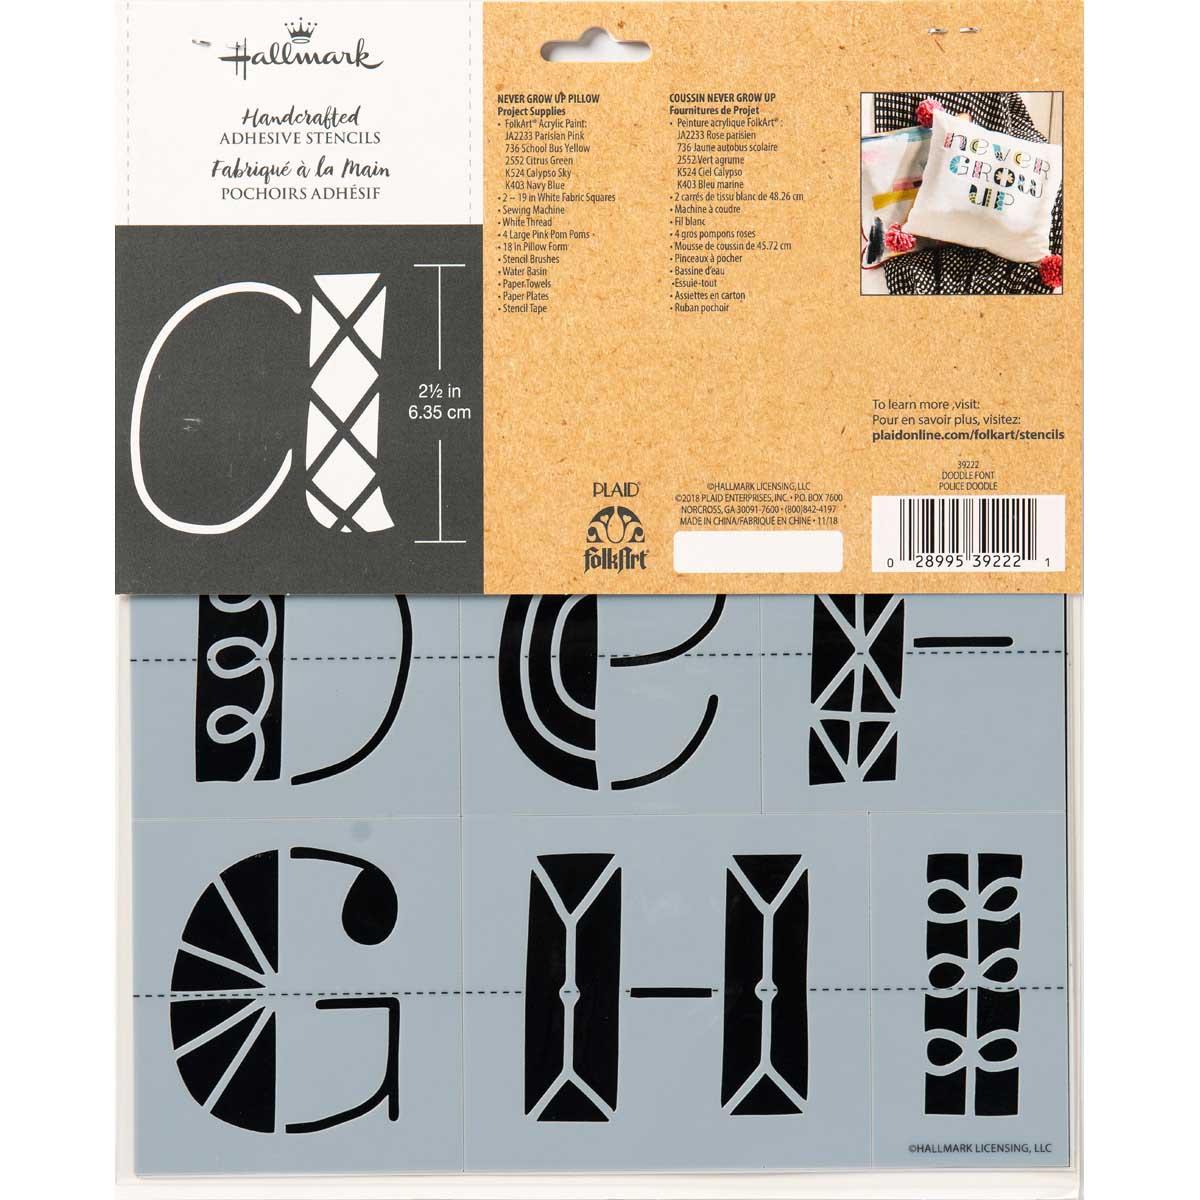 Hallmark Handcrafted Adhesive Stencils - Doodle Font, 8-1/2